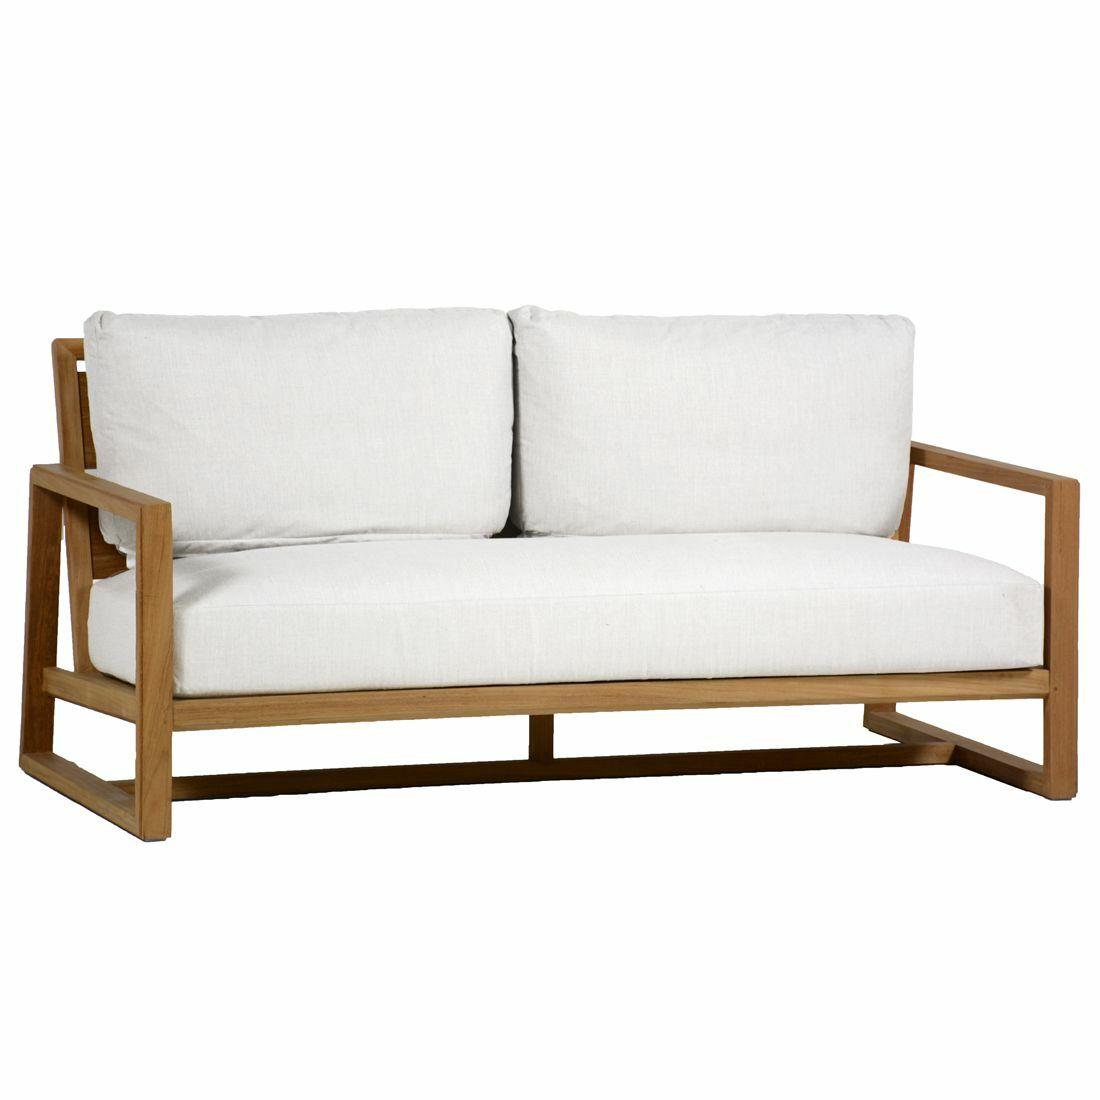 Avondale Patio Sofa with Cushions